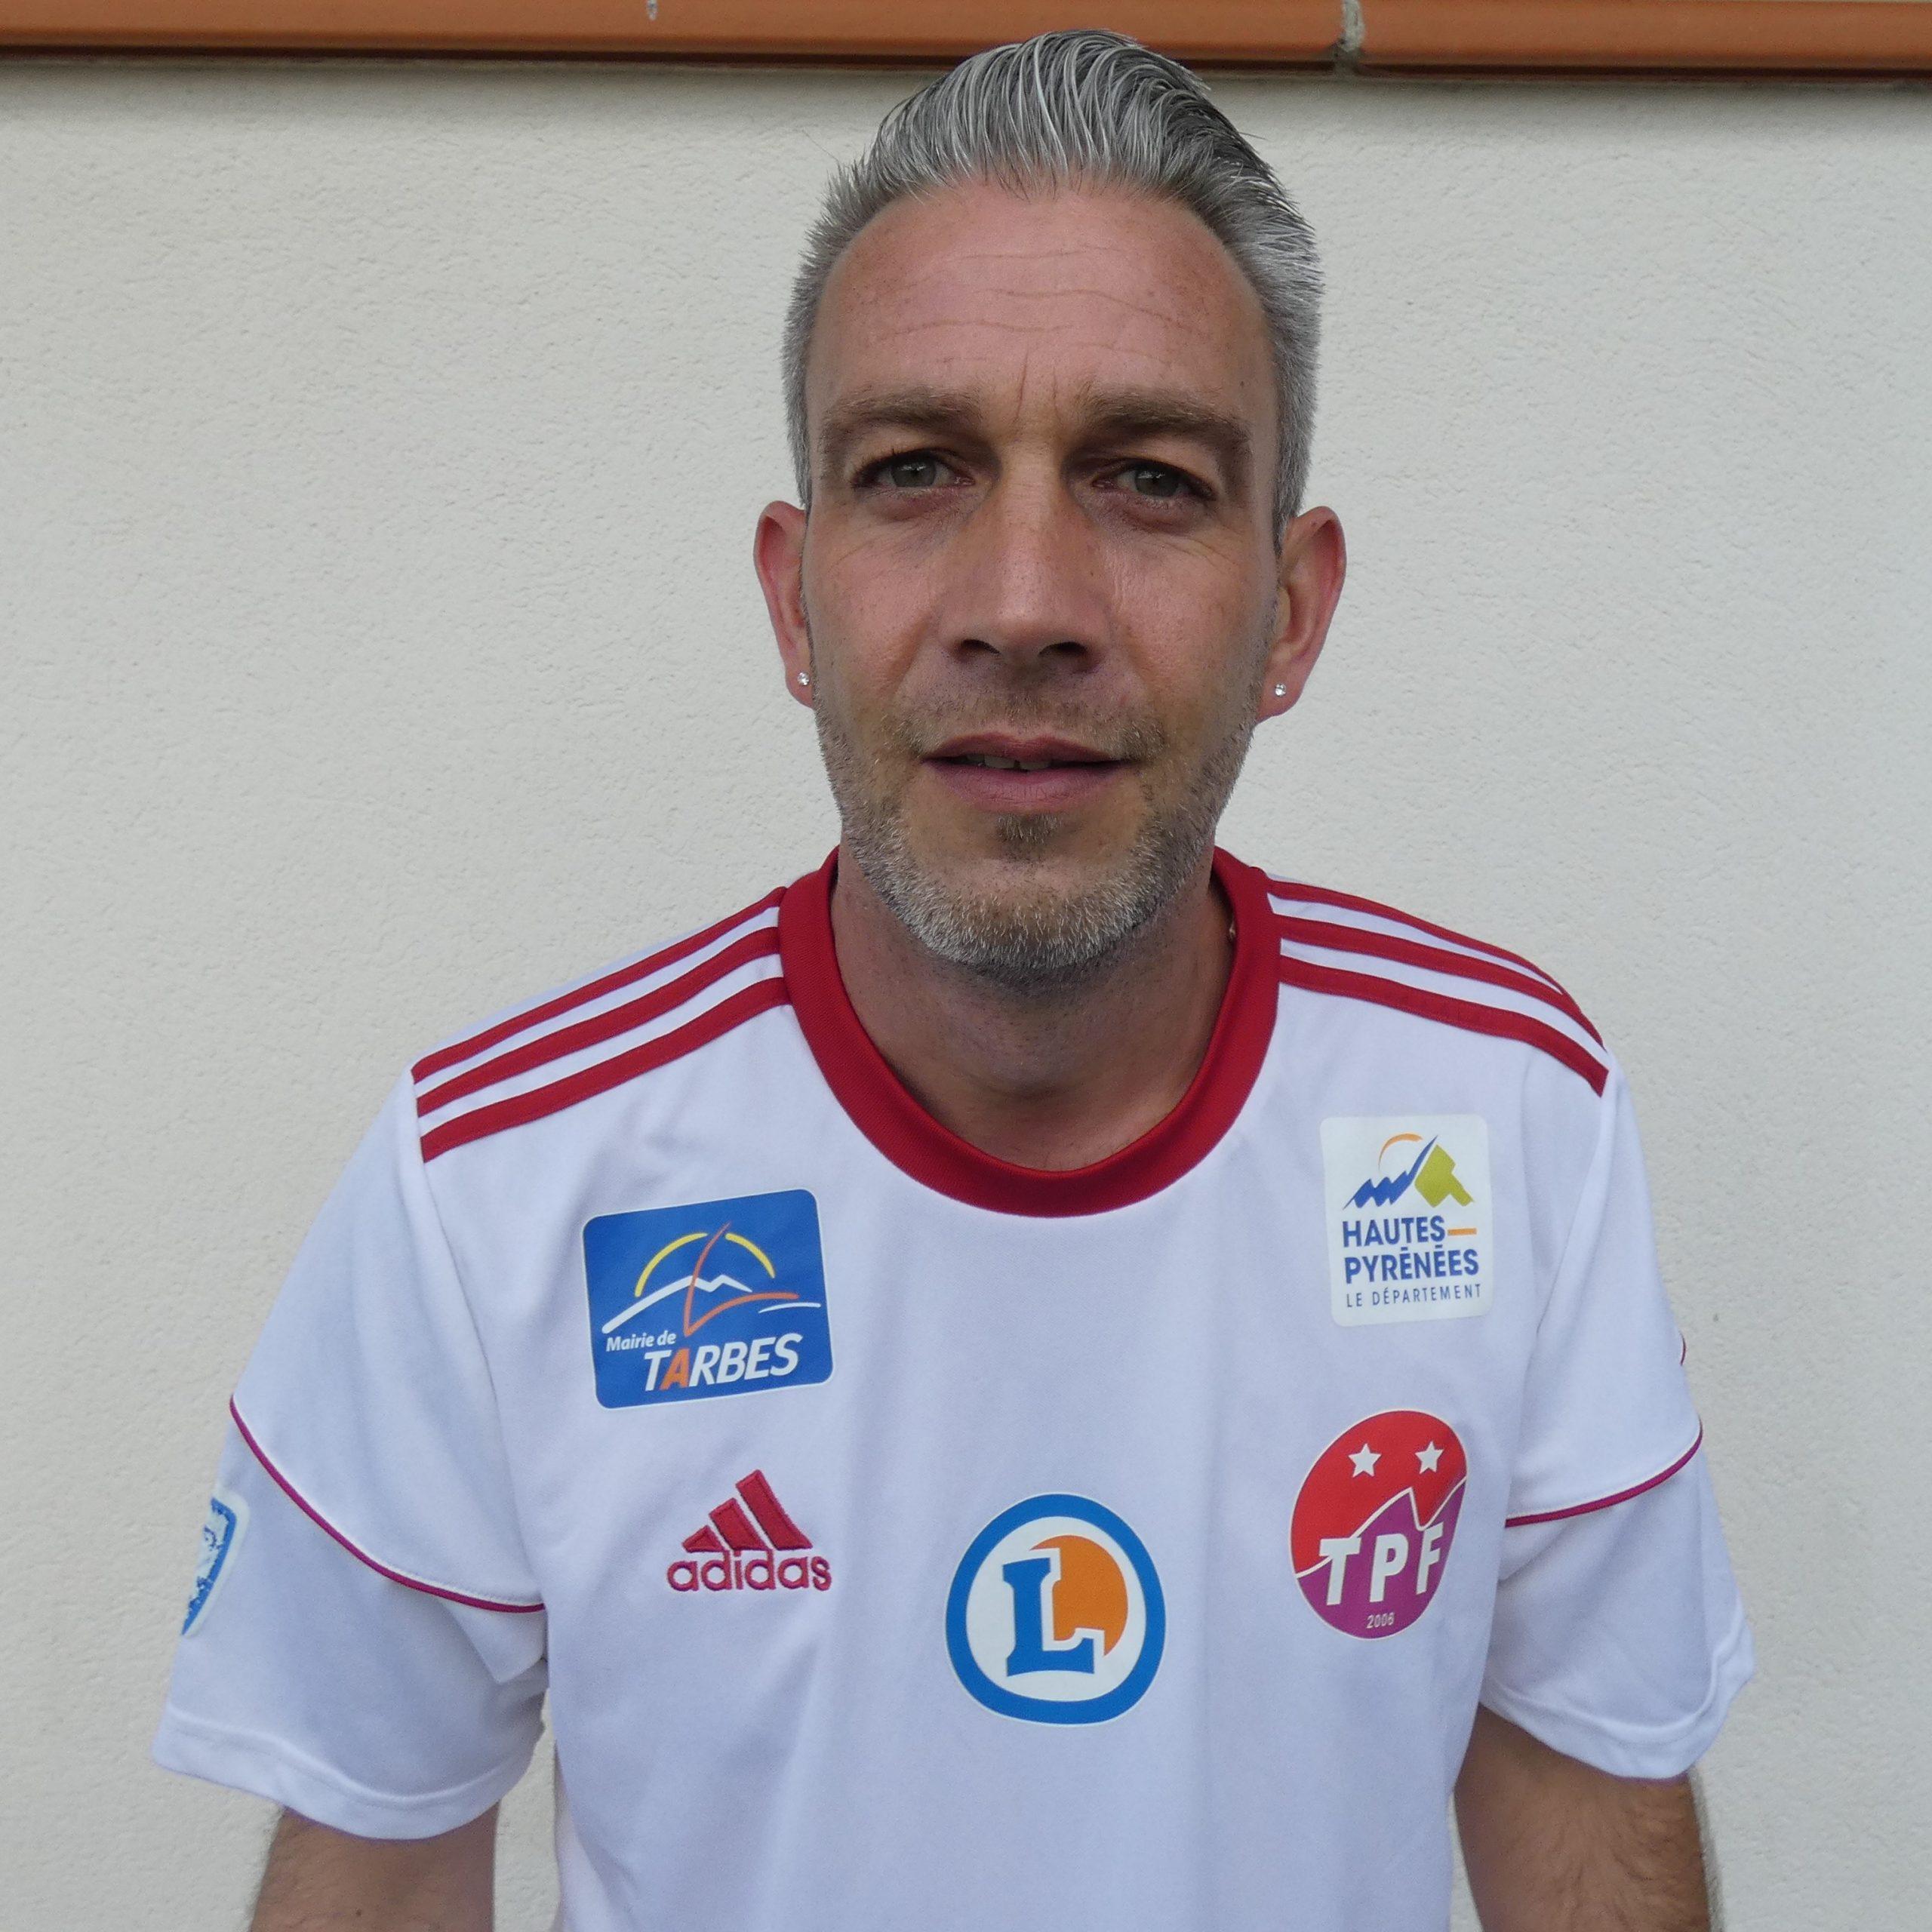 Pierre LUSSAUT